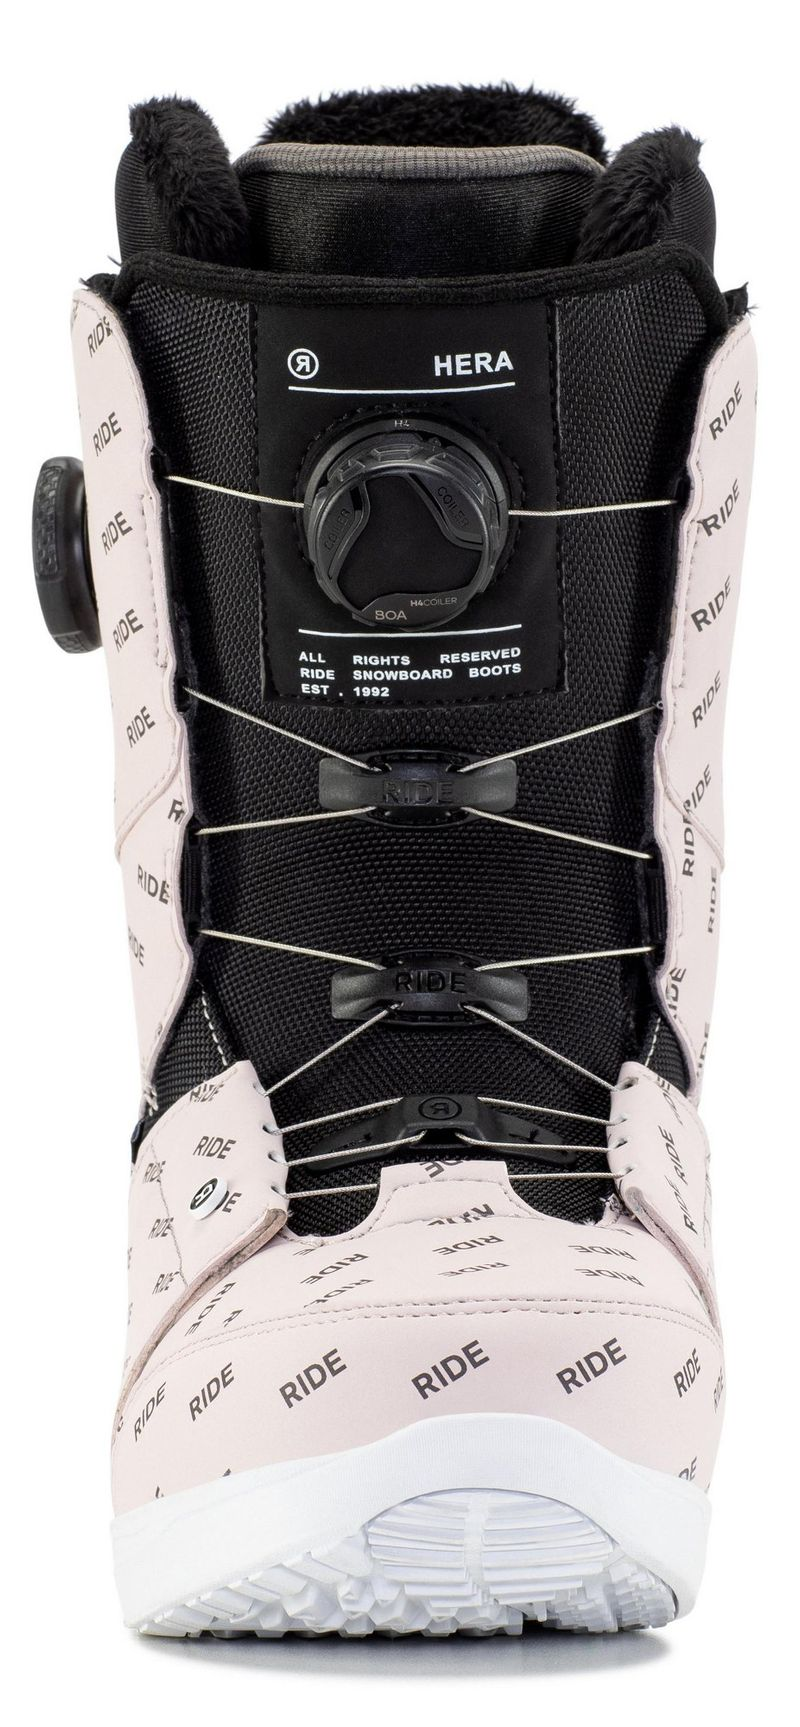 Ride-Hera-Women-s-Snowboard-Boots-2021